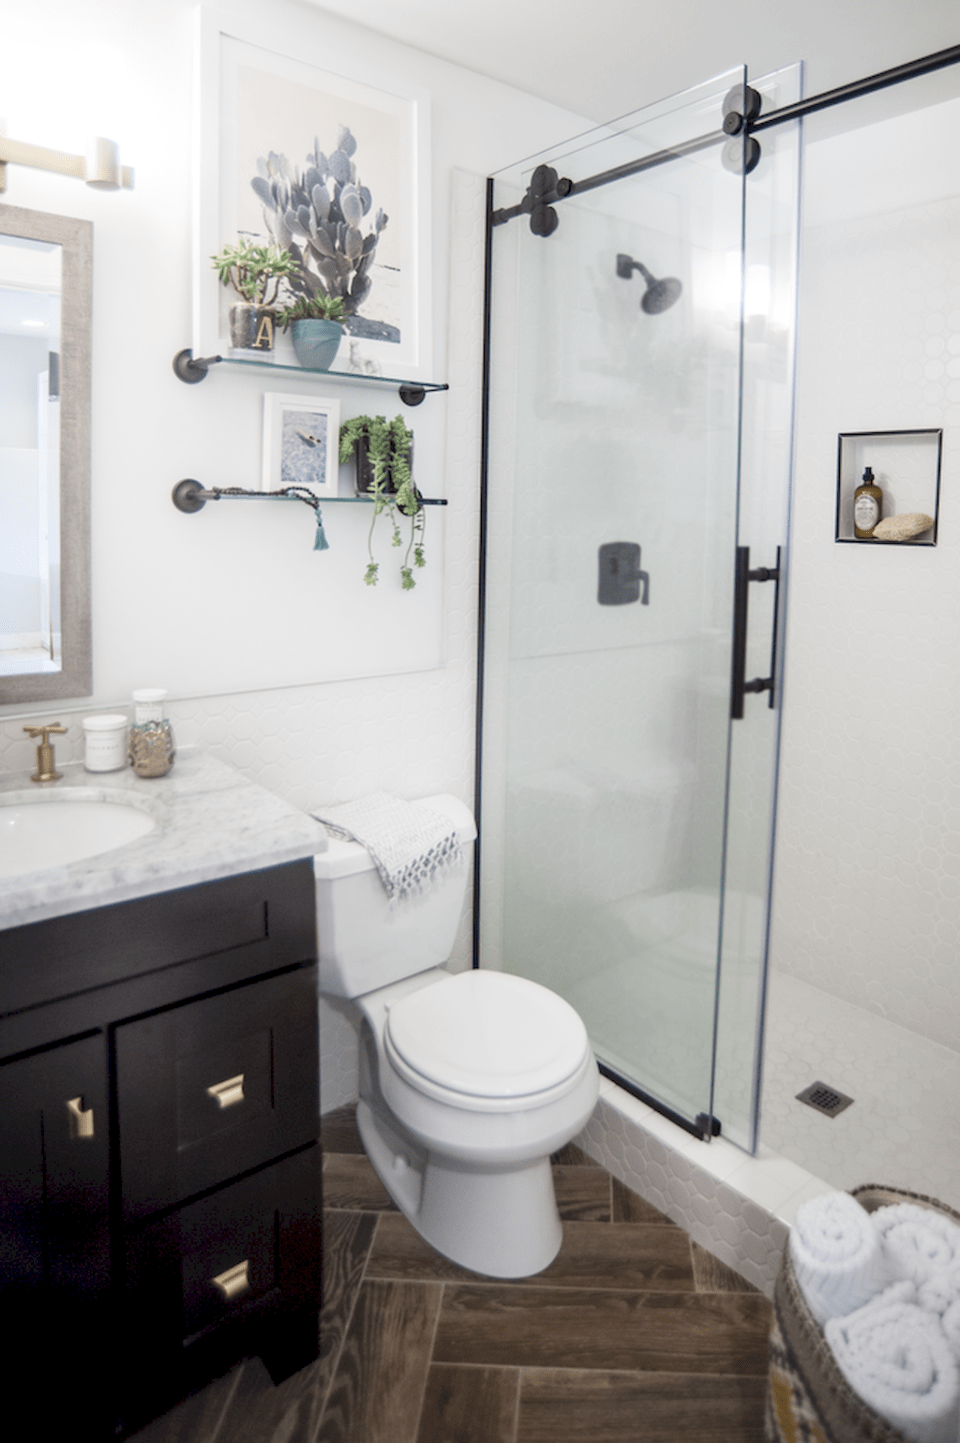 85 beautiful small bathroom decor ideas on a budget on bathroom renovation ideas on a budget id=95311